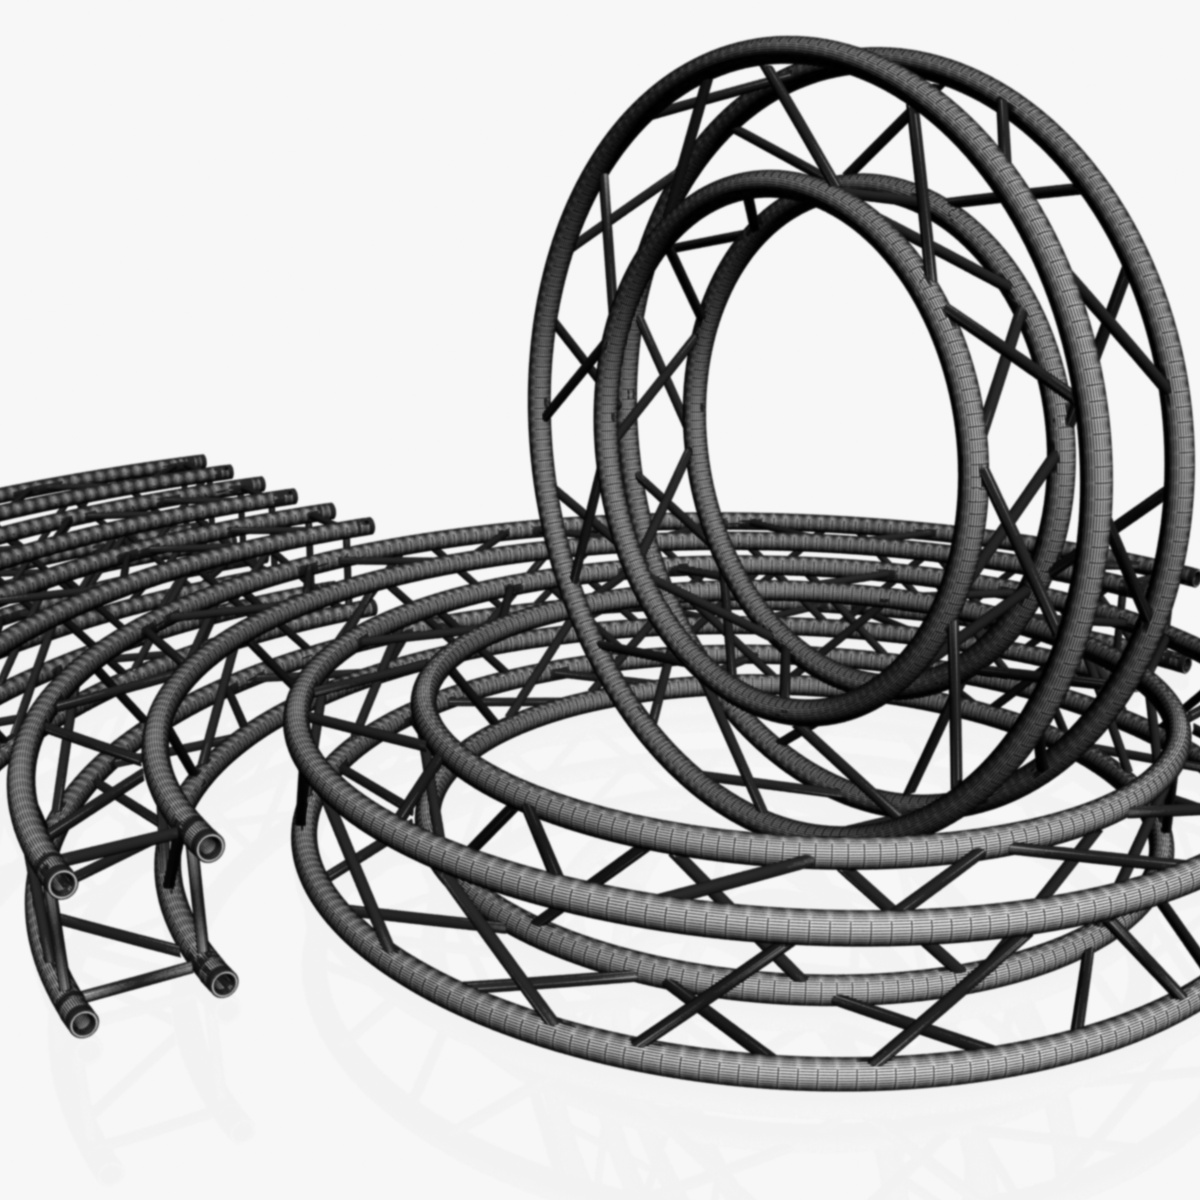 circle square truss modular collection 3d model 3ds max dxf fbx c4d dae  texture obj 252338